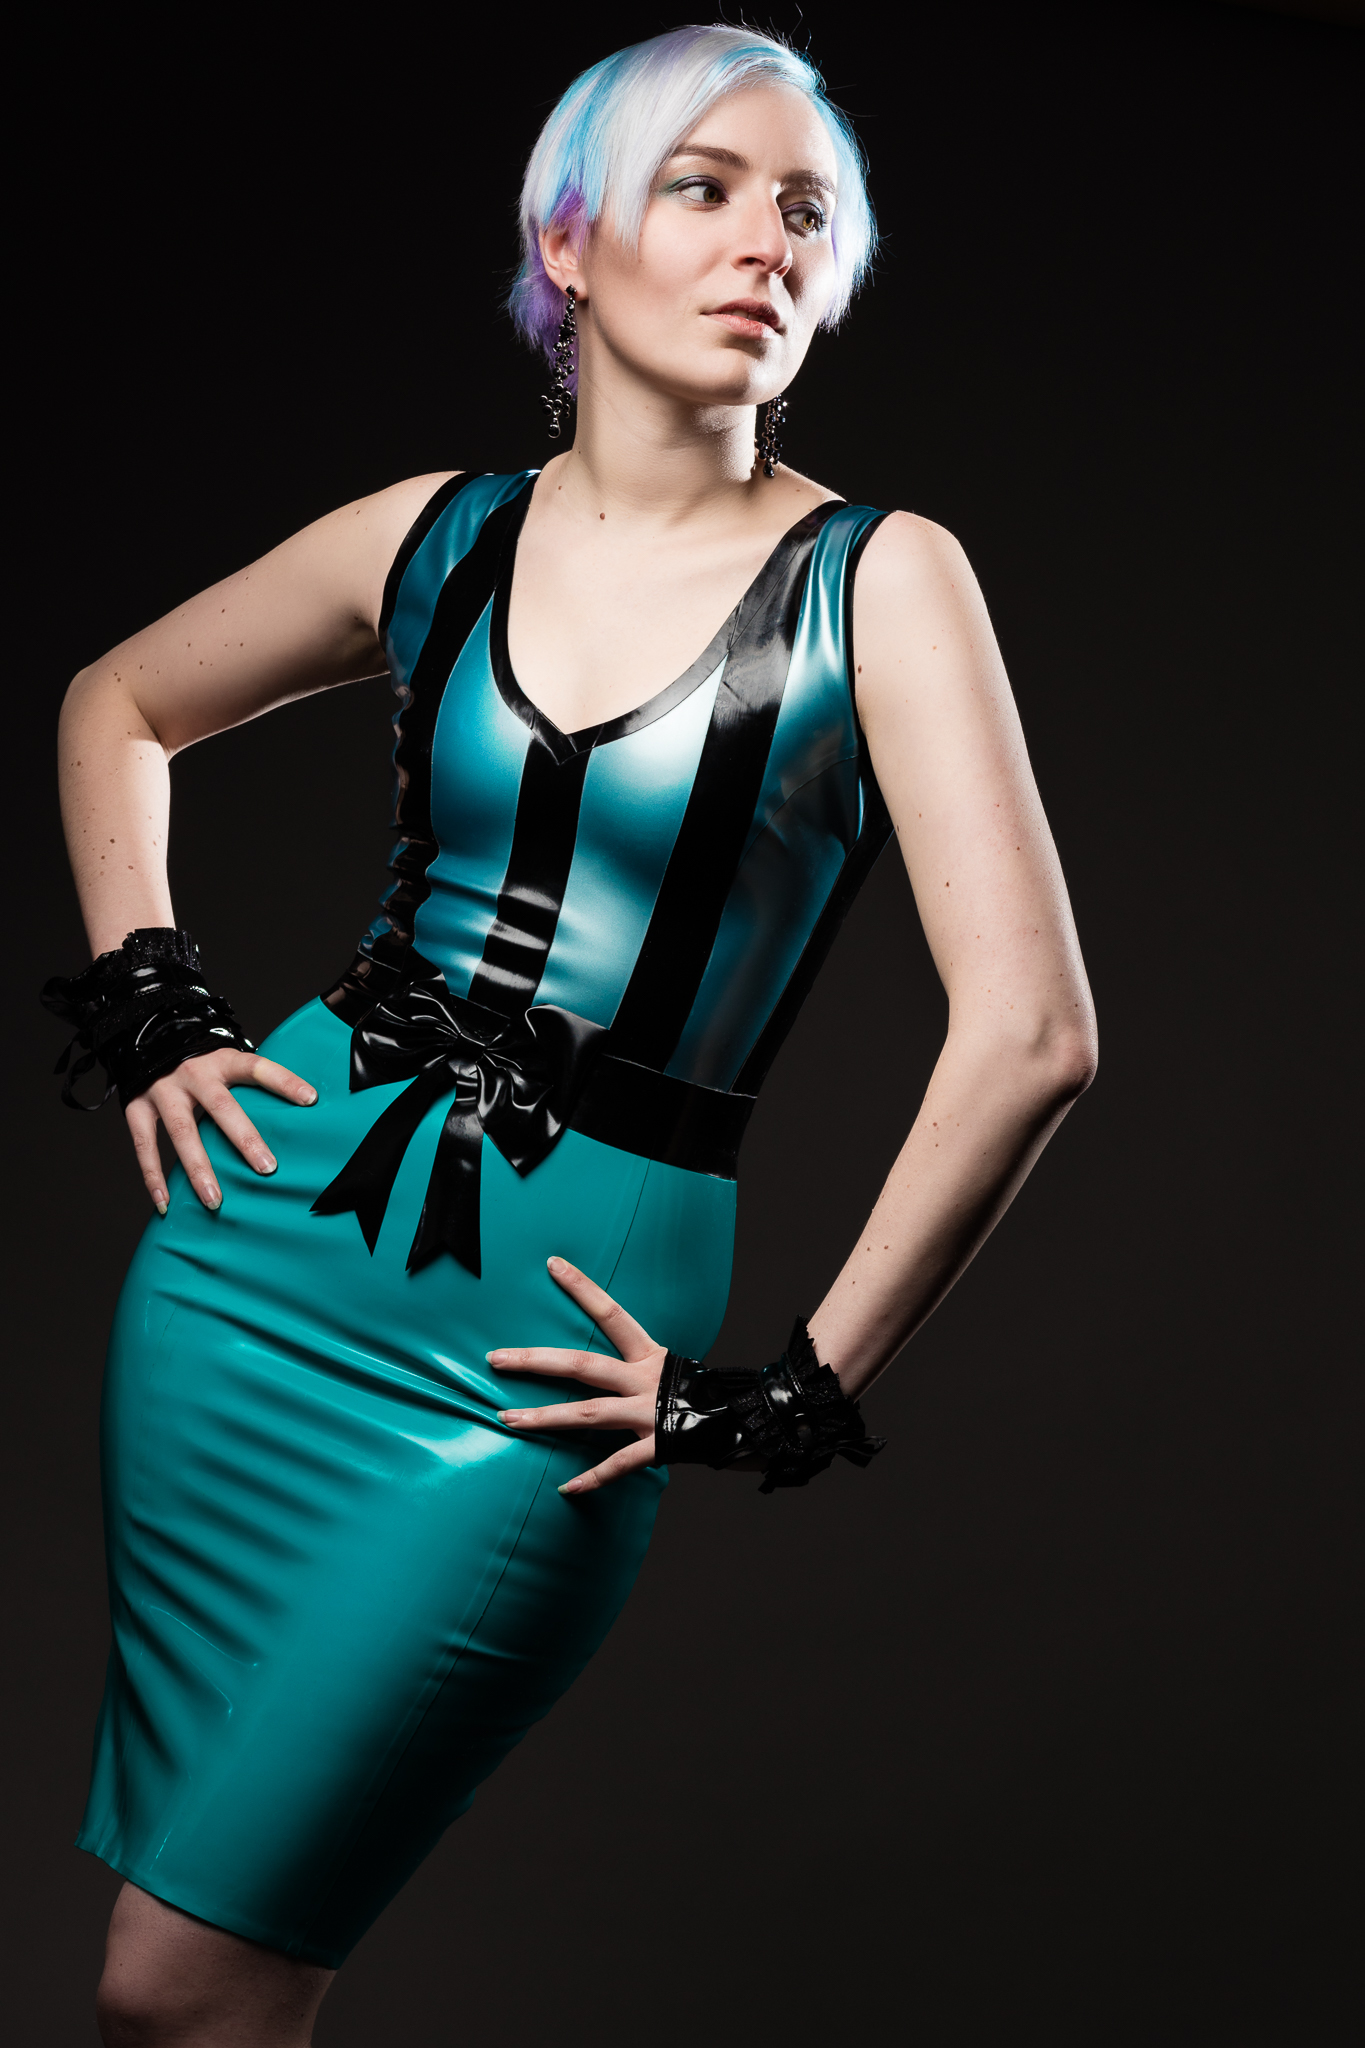 Anne Drake Wears Latex by Westward Bound